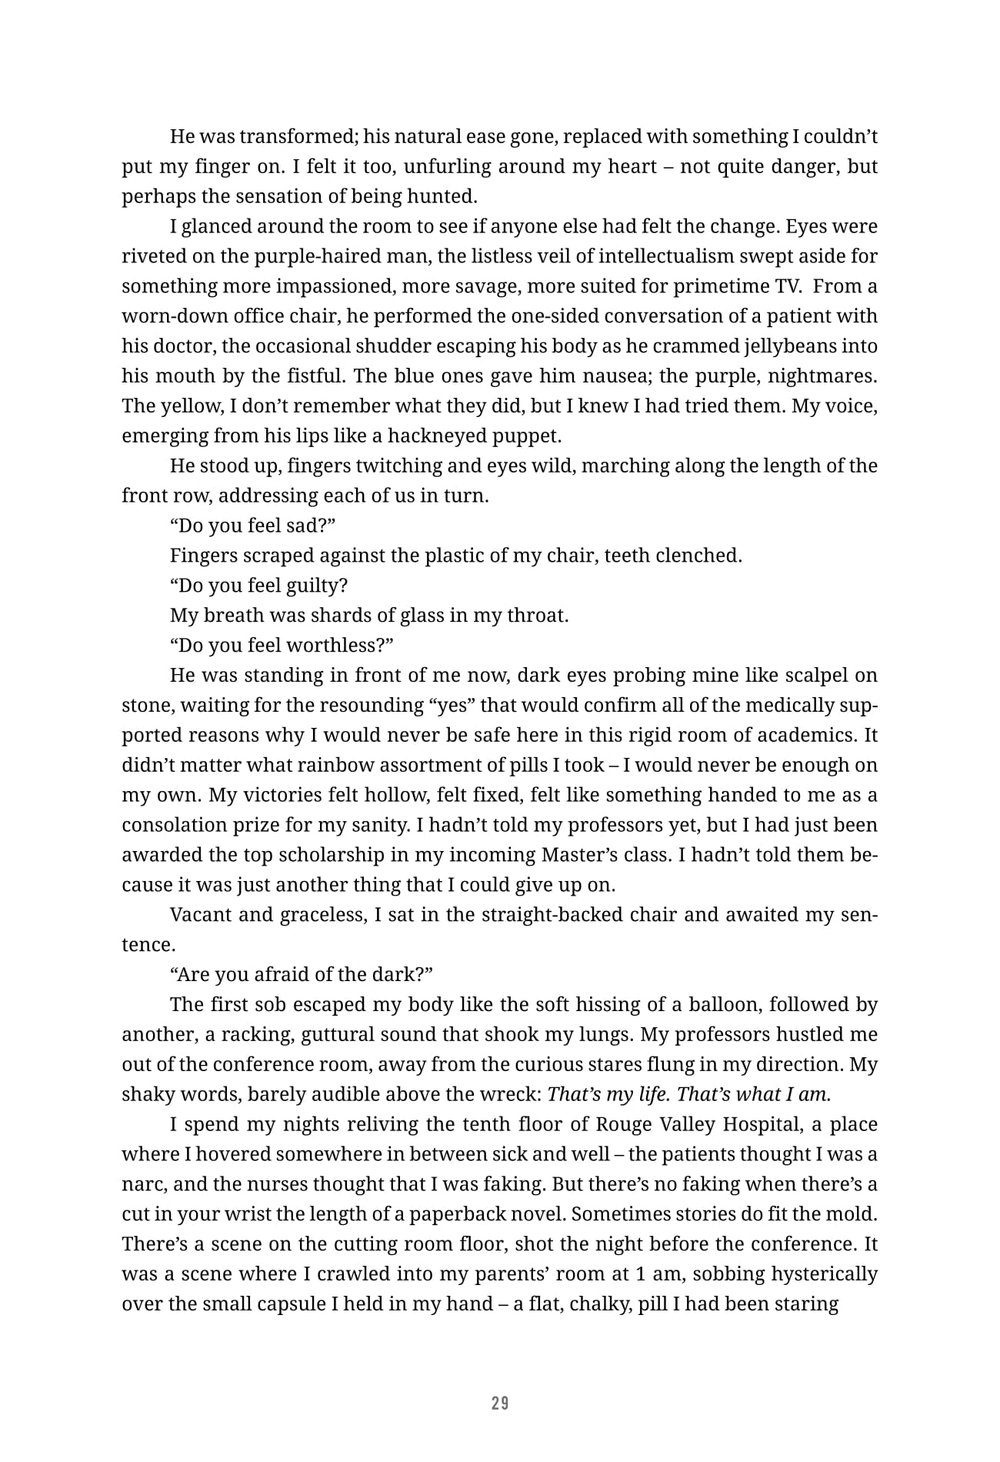 Final_PDF.30-1.jpg